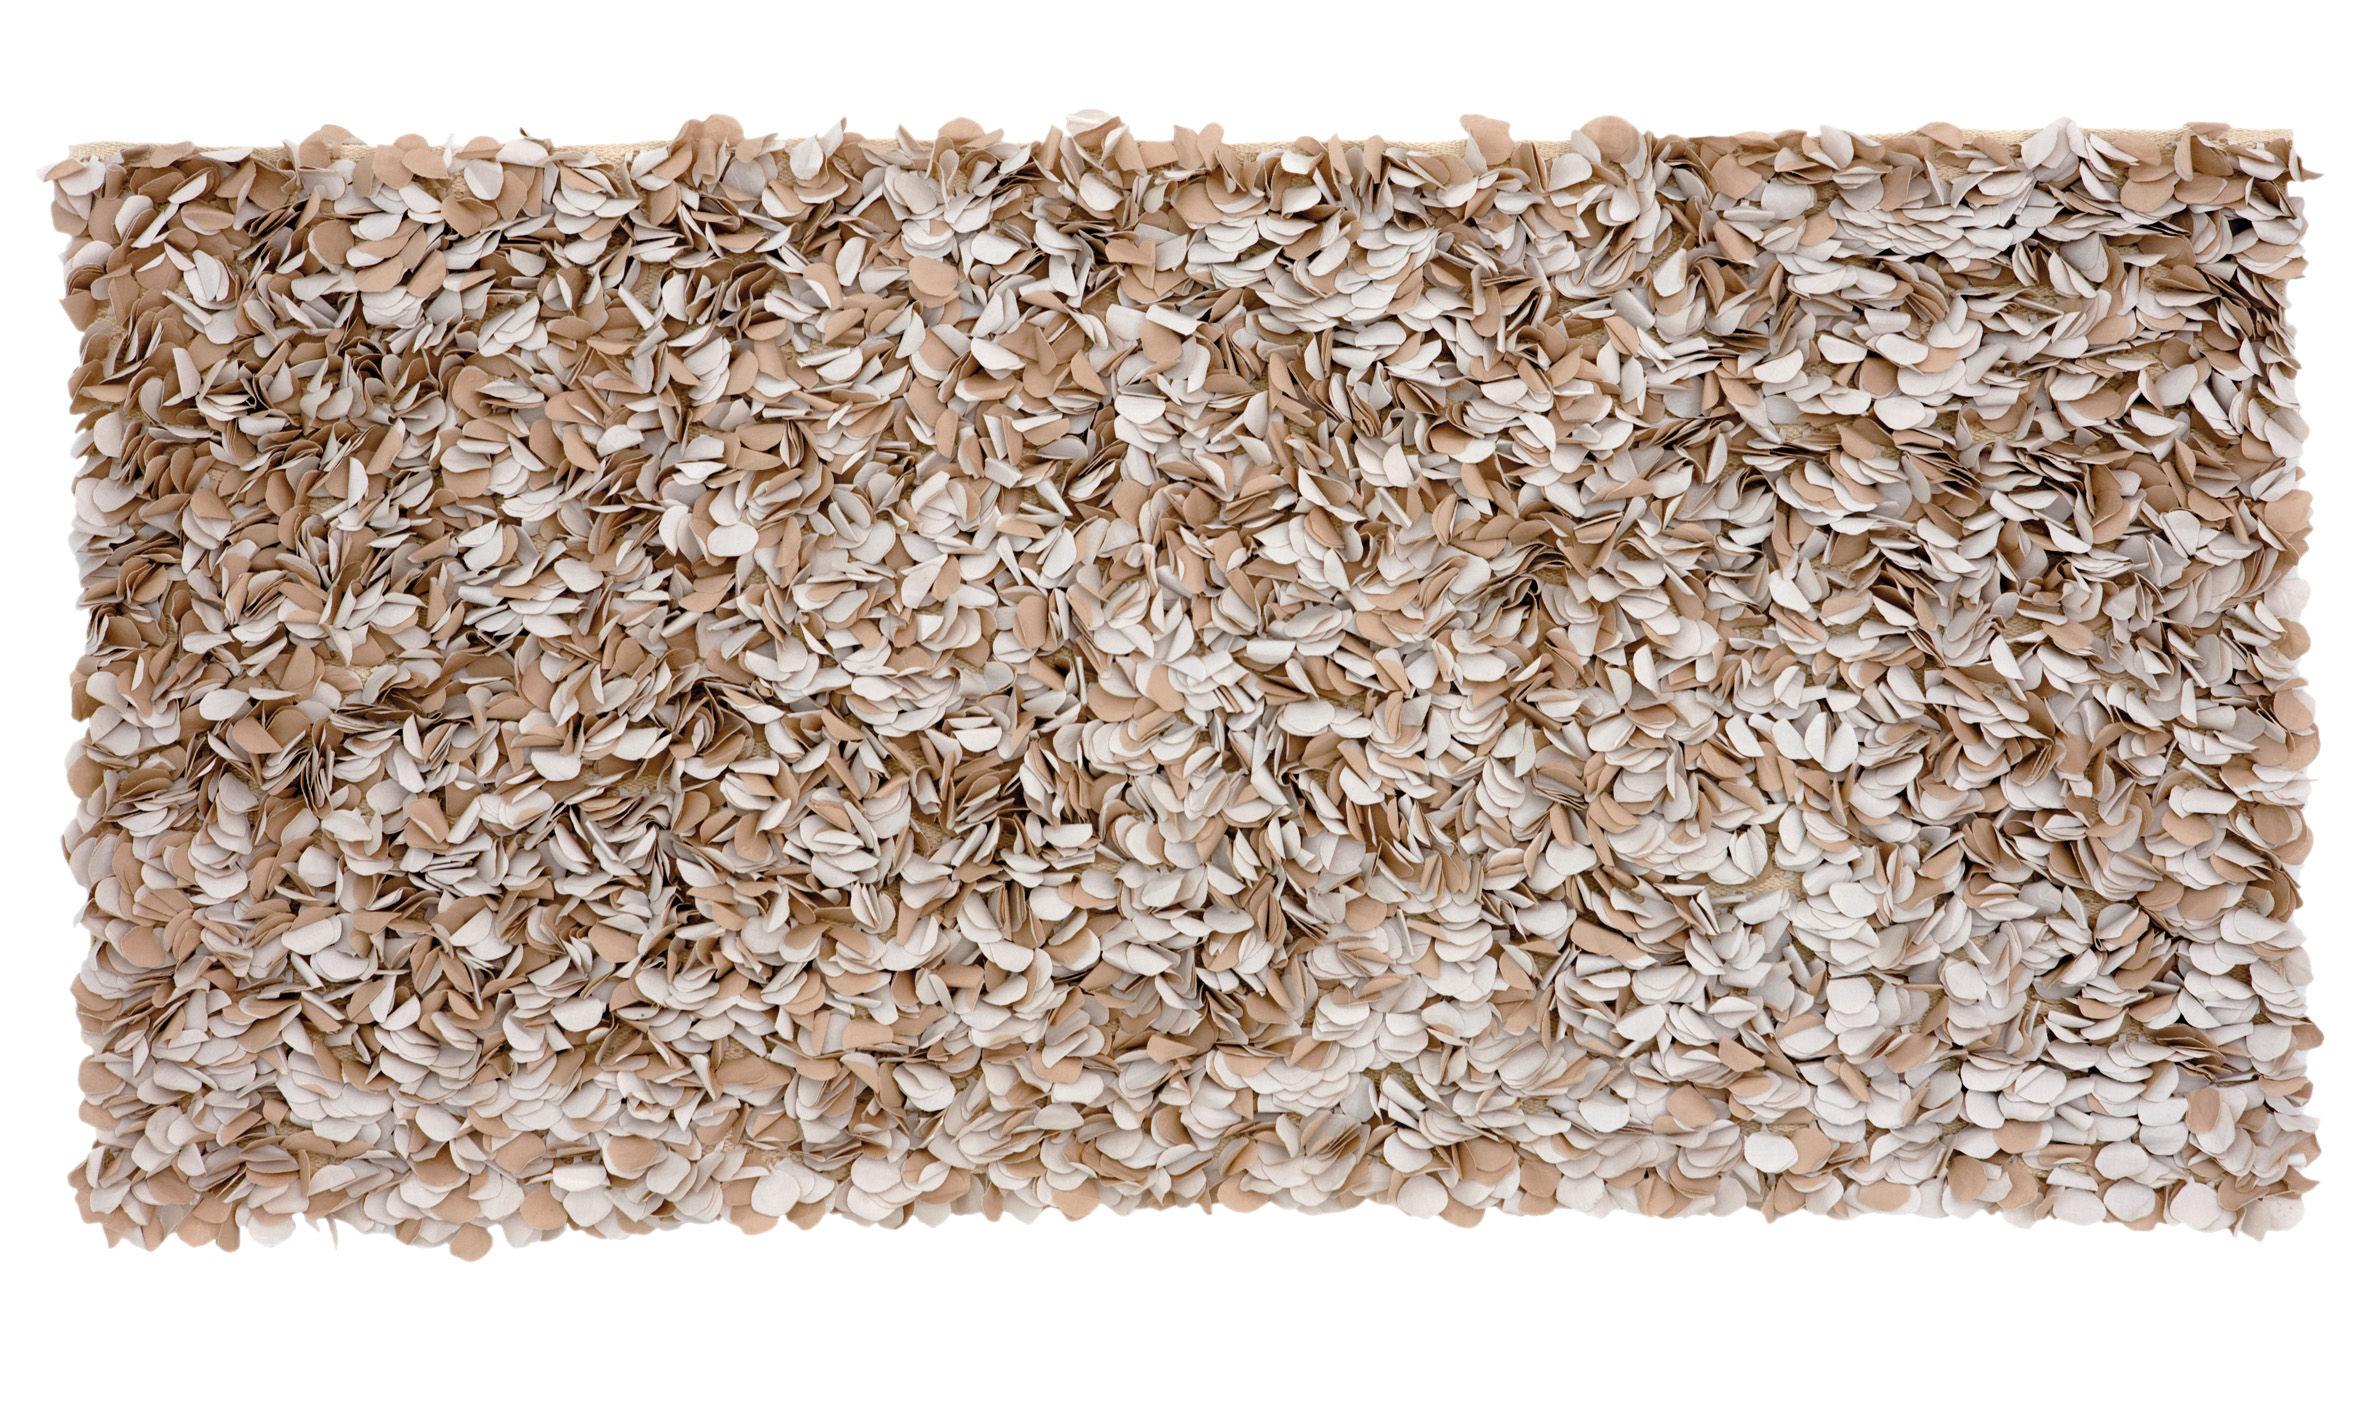 Möbel - Betten - Testa  Double-side Bettkopf - Nanimarquina - Blütenblätter in zwei Farben: natur / hellbraun - Baumwolle